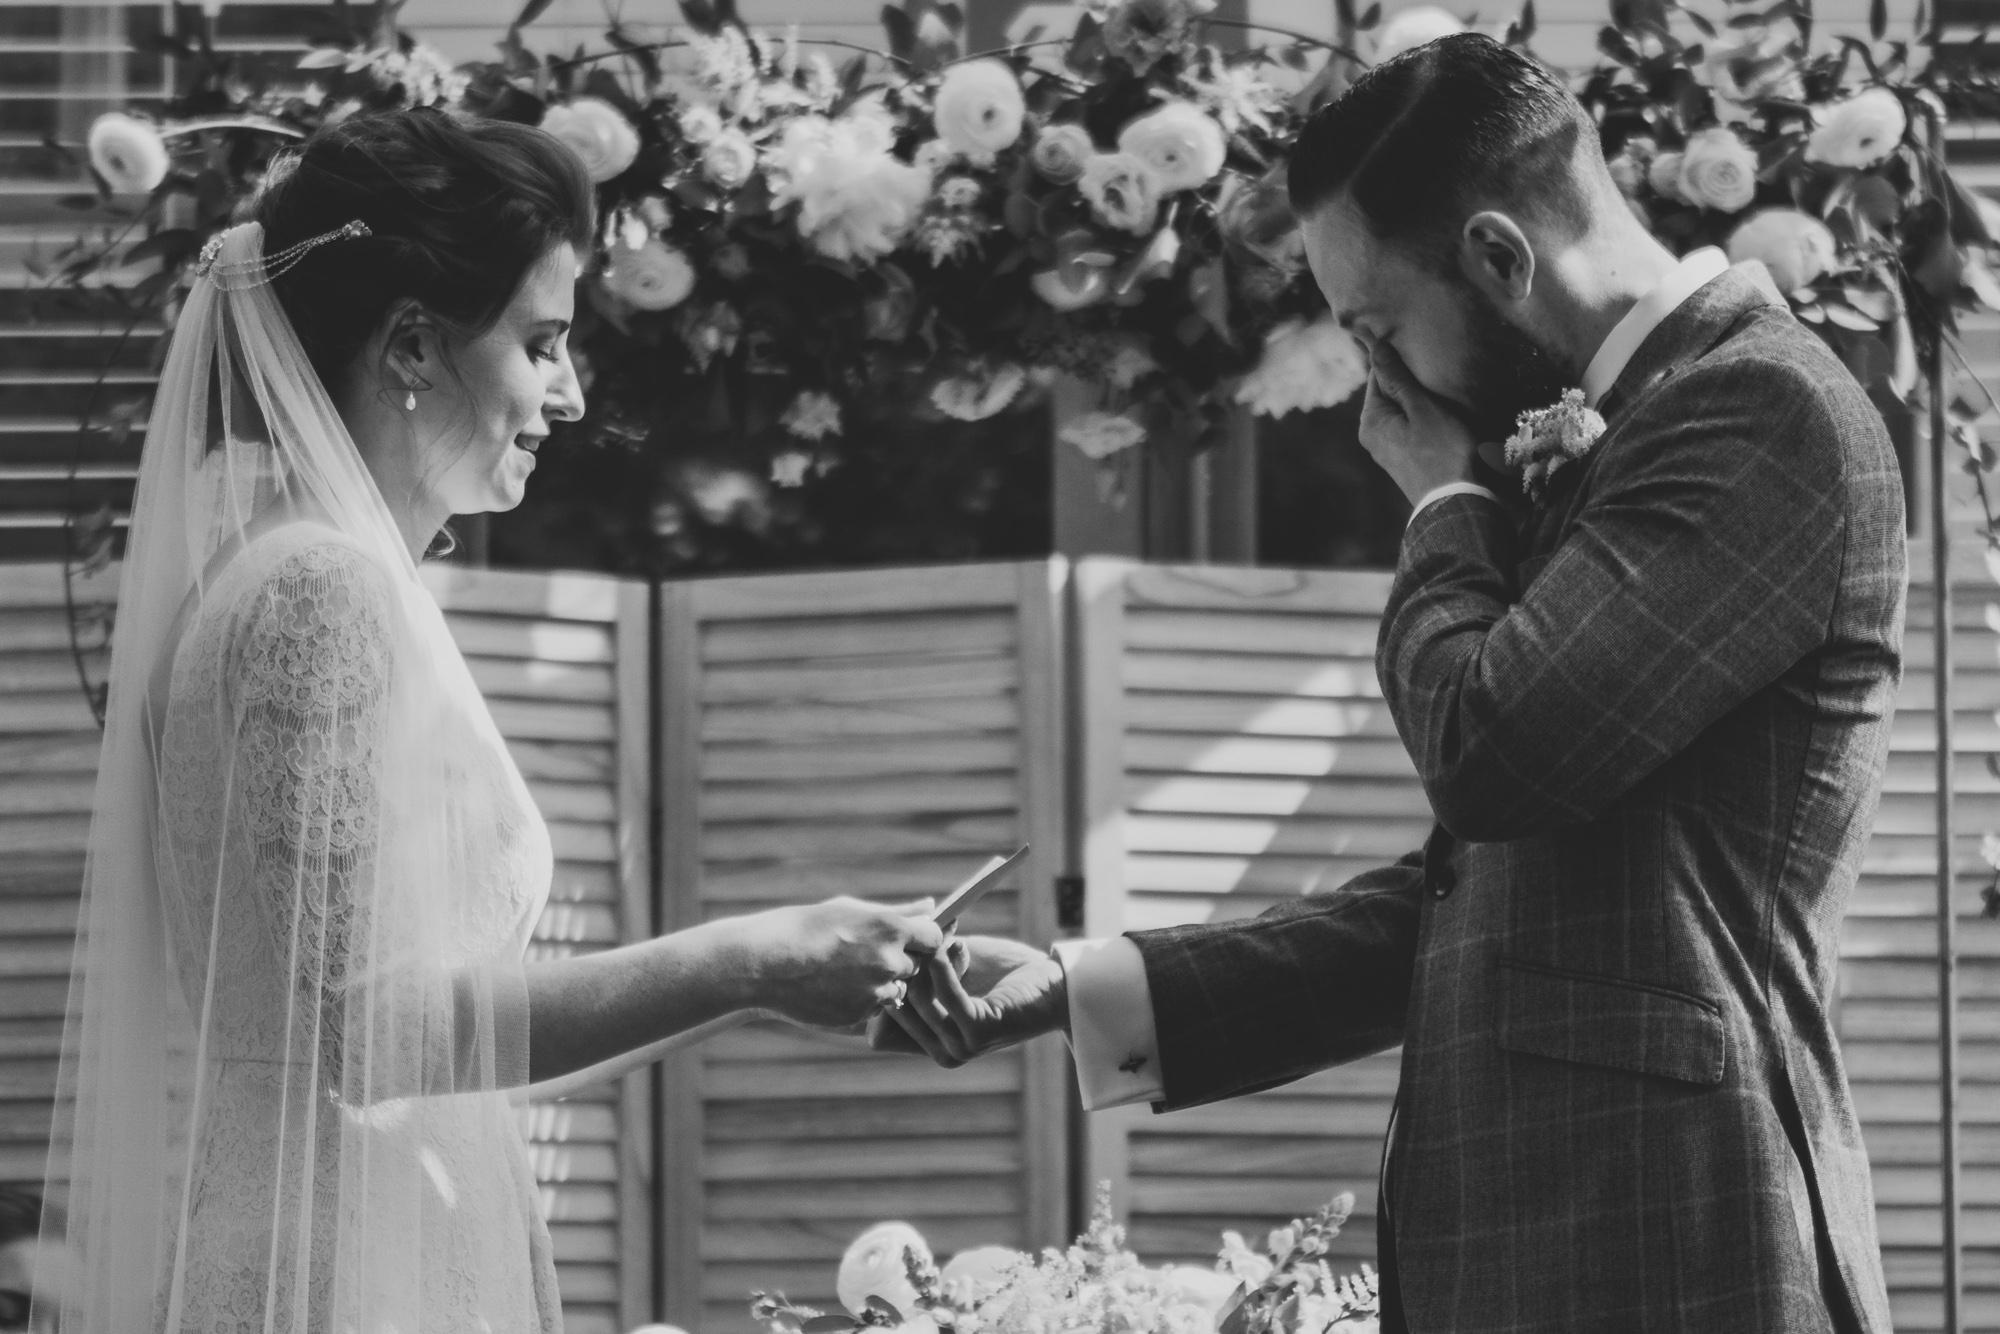 Kate-Beaumont-Lace-Flared-Dahlia-Gown-Leeds-Wedding-Bloom-Weddings-21.jpg